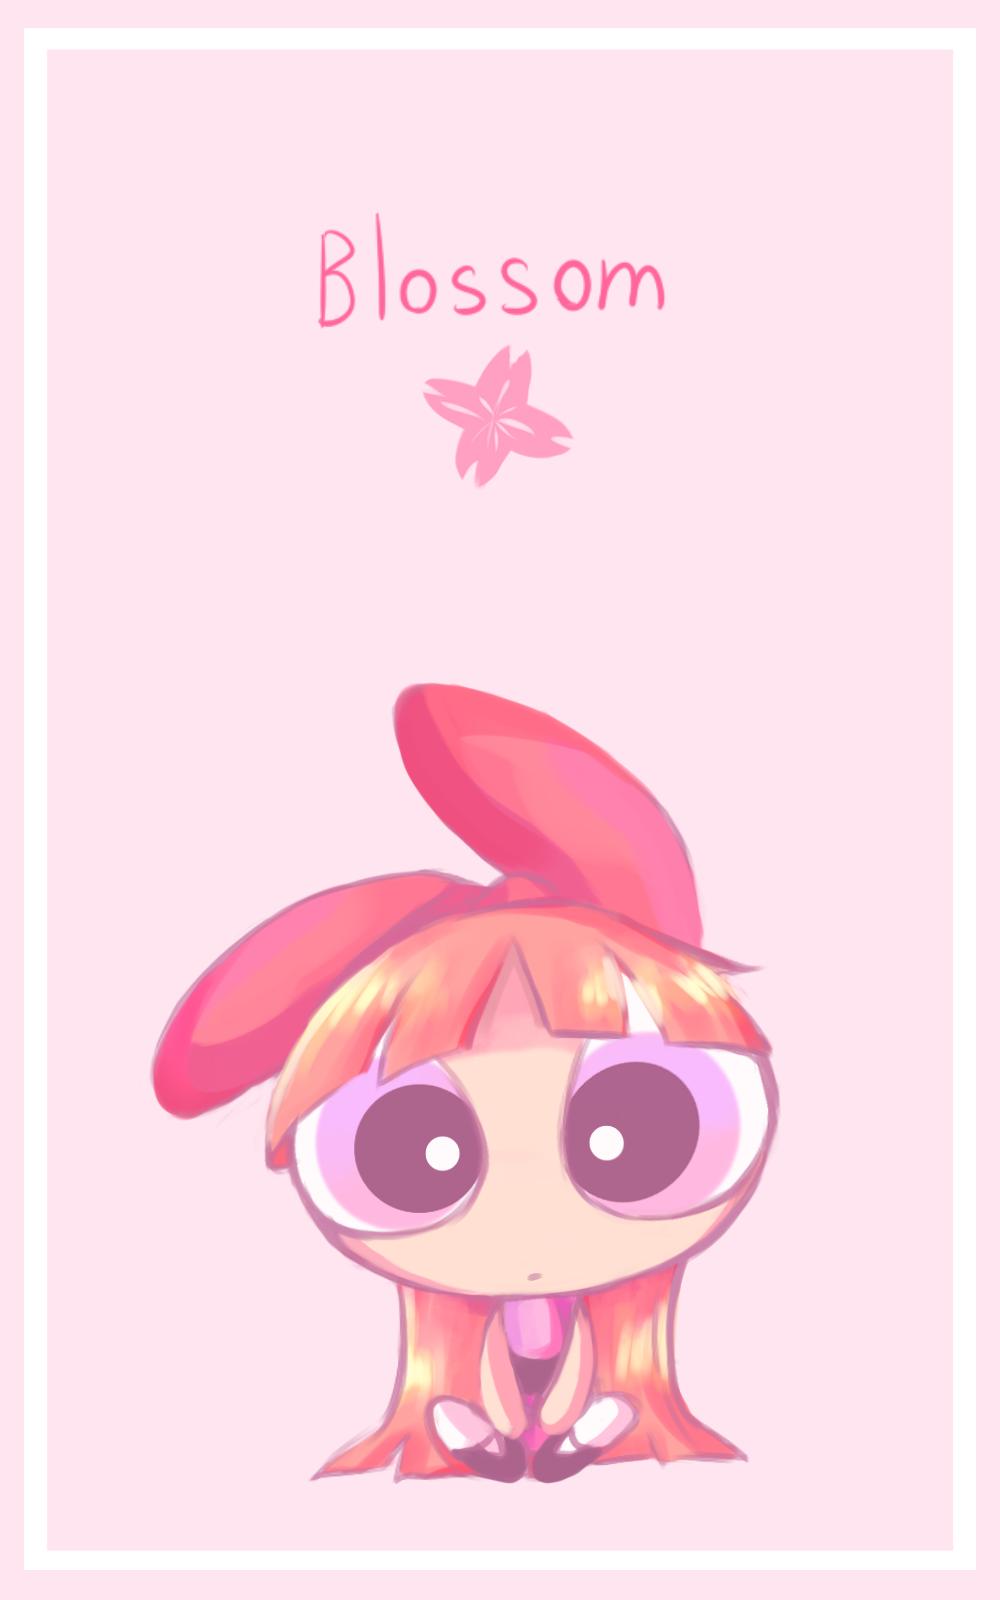 Blossom Ppg Fanart By Yunreru パワーパフガールズ パワーパフ